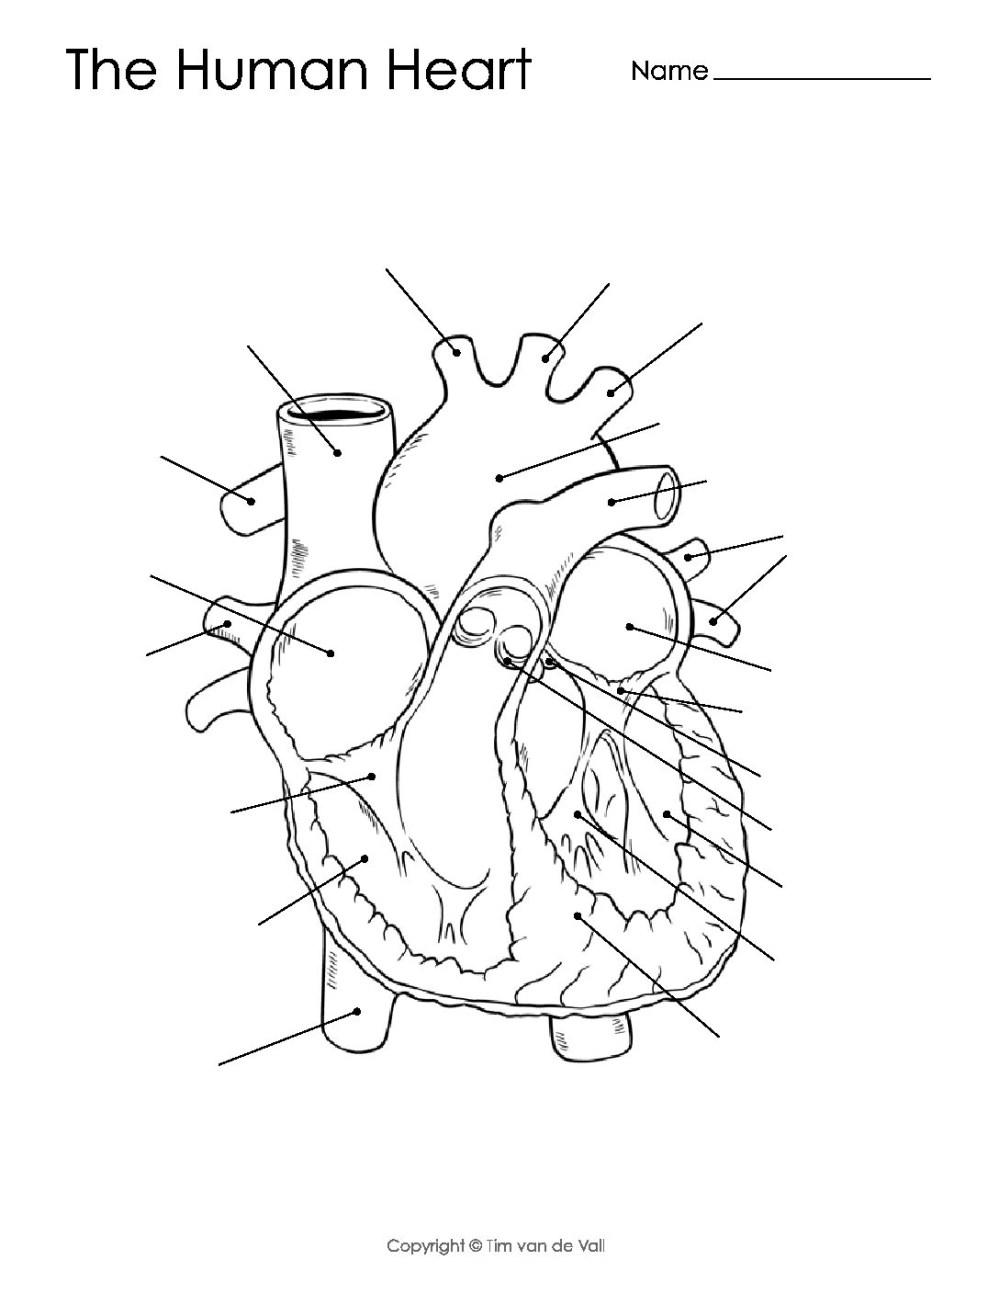 medium resolution of Heart Healthy Habit Worksheet   Printable Worksheets and Activities for  Teachers